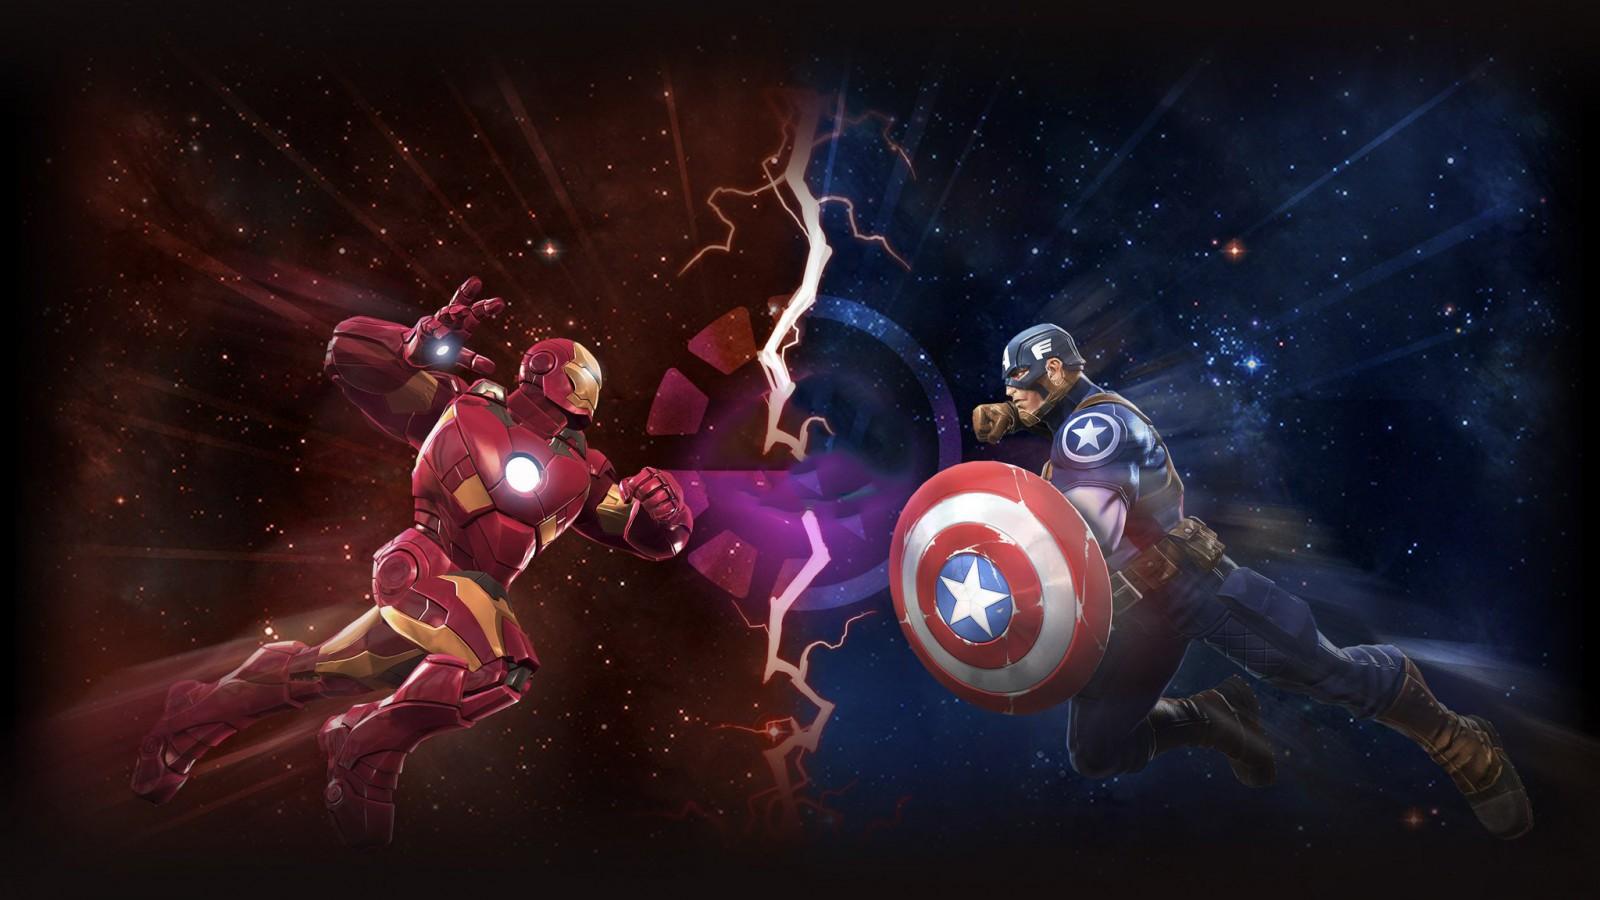 Free Download Wallpaper Naruto Shippuden 3d Iron Man Vs Captain America Artwork Wallpapers Hd